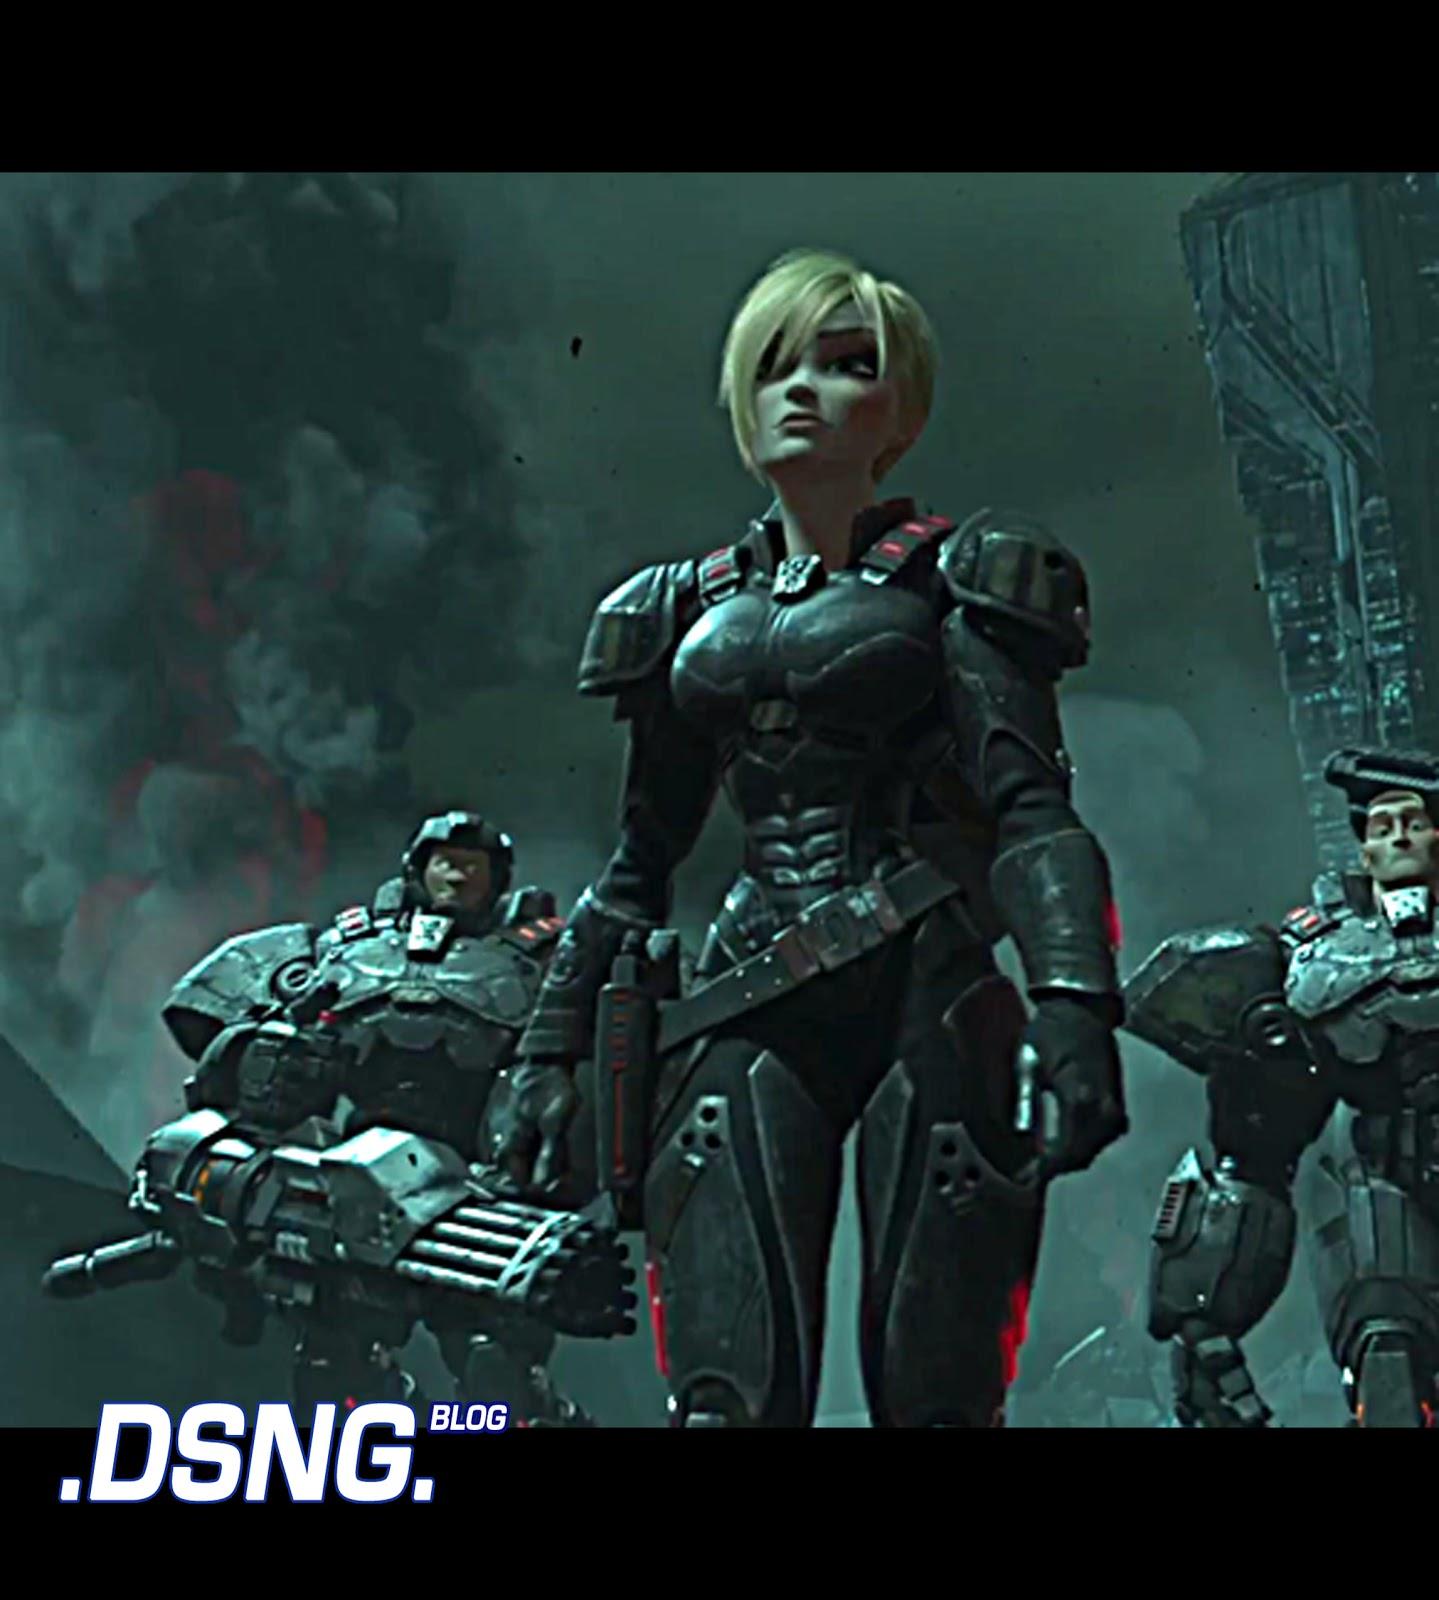 http://1.bp.blogspot.com/-JKs6qzltd_o/UJcEyivMGeI/AAAAAAAAHU4/tcKXRKTuDBM/s1600/Sergeant+Tamora+Jean+Calhoun+sexy+bio+pic+female+space+marine+heroes+duty+disney+wreck+it+ralph+wallpaper+8.jpg